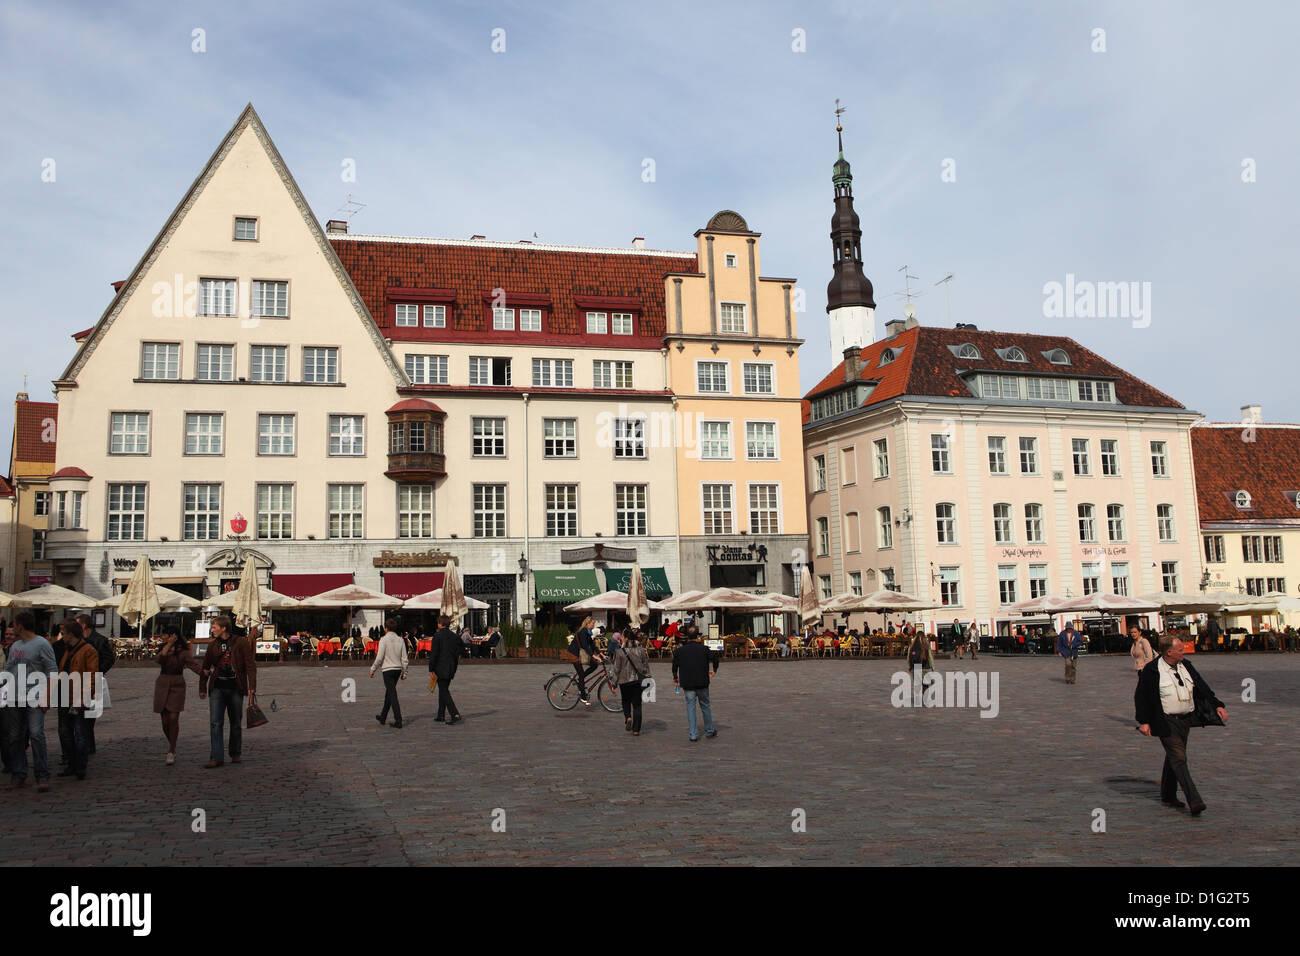 Alltag und Gebäude am Rathausplatz (Raekoja Plats), UNESCO-Weltkulturerbe, Tallinn, Estland, Europa Stockbild